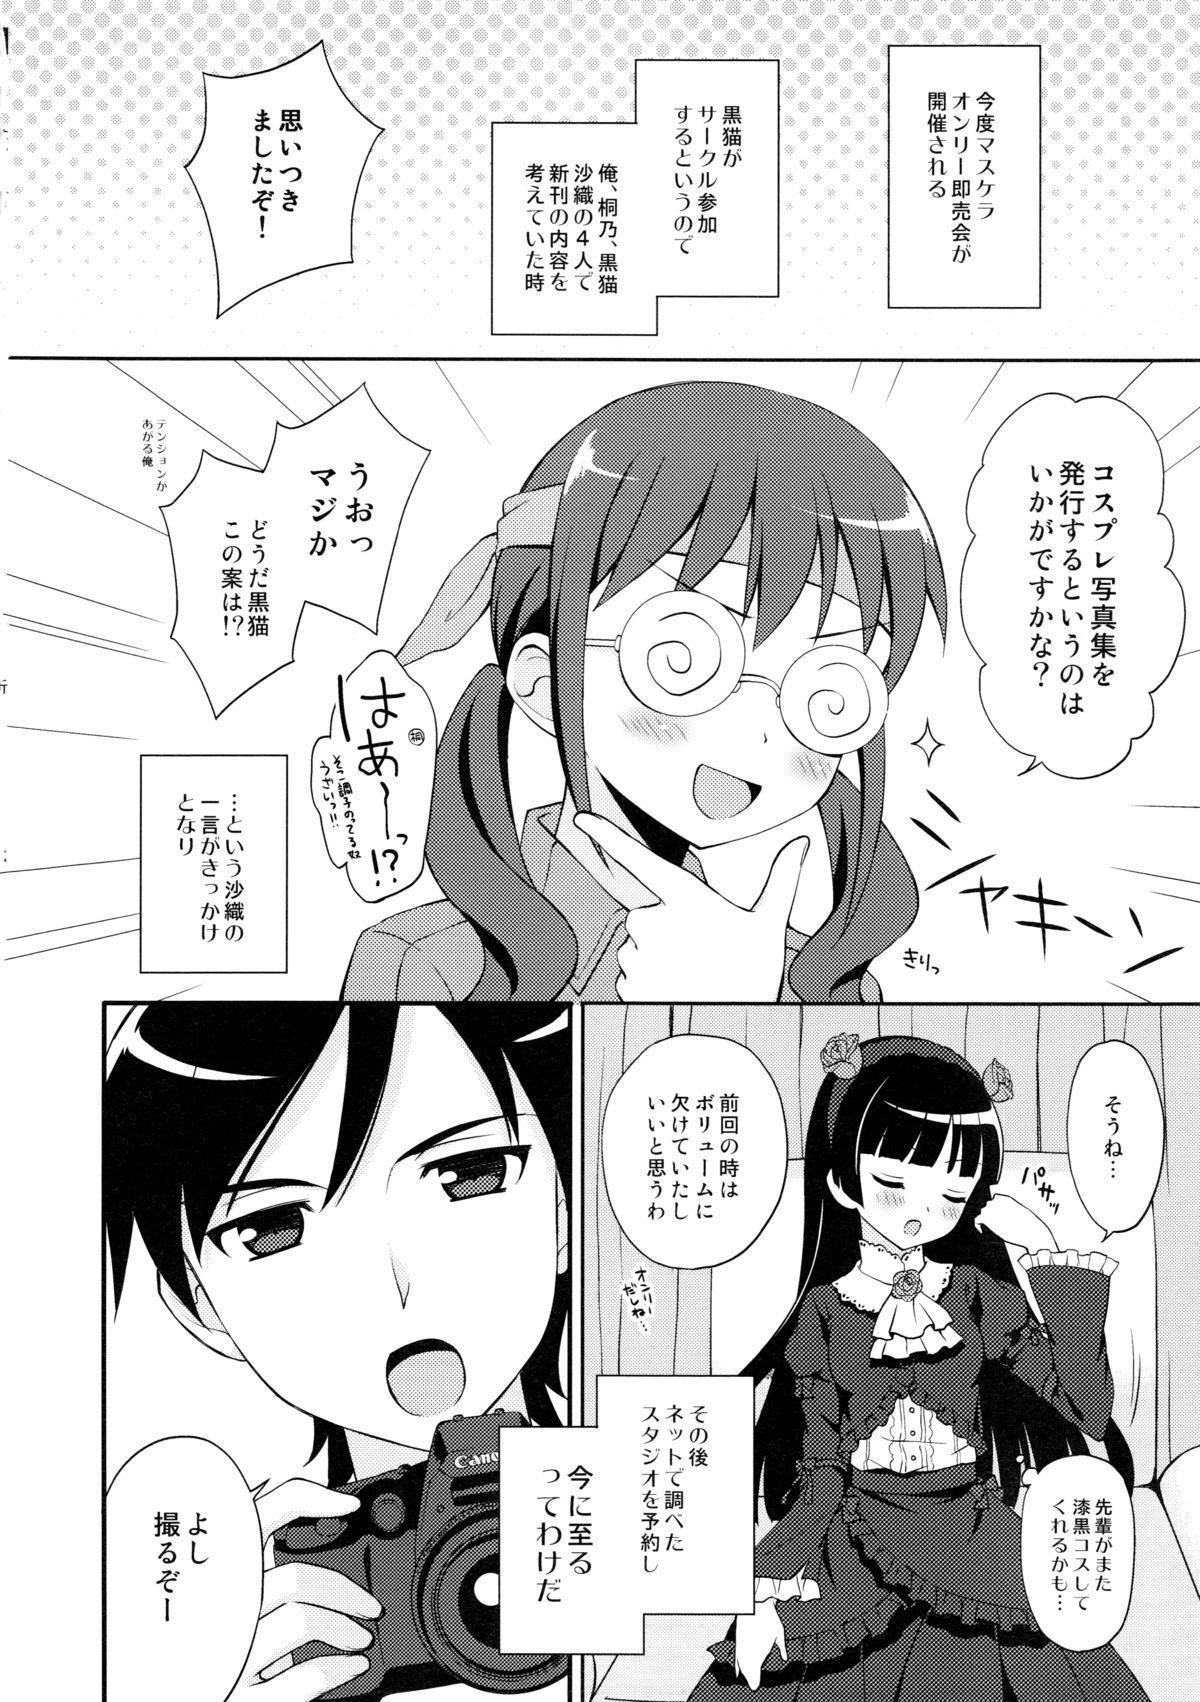 School-mer! School Mizugi Bloomer Joshi Anthology 80